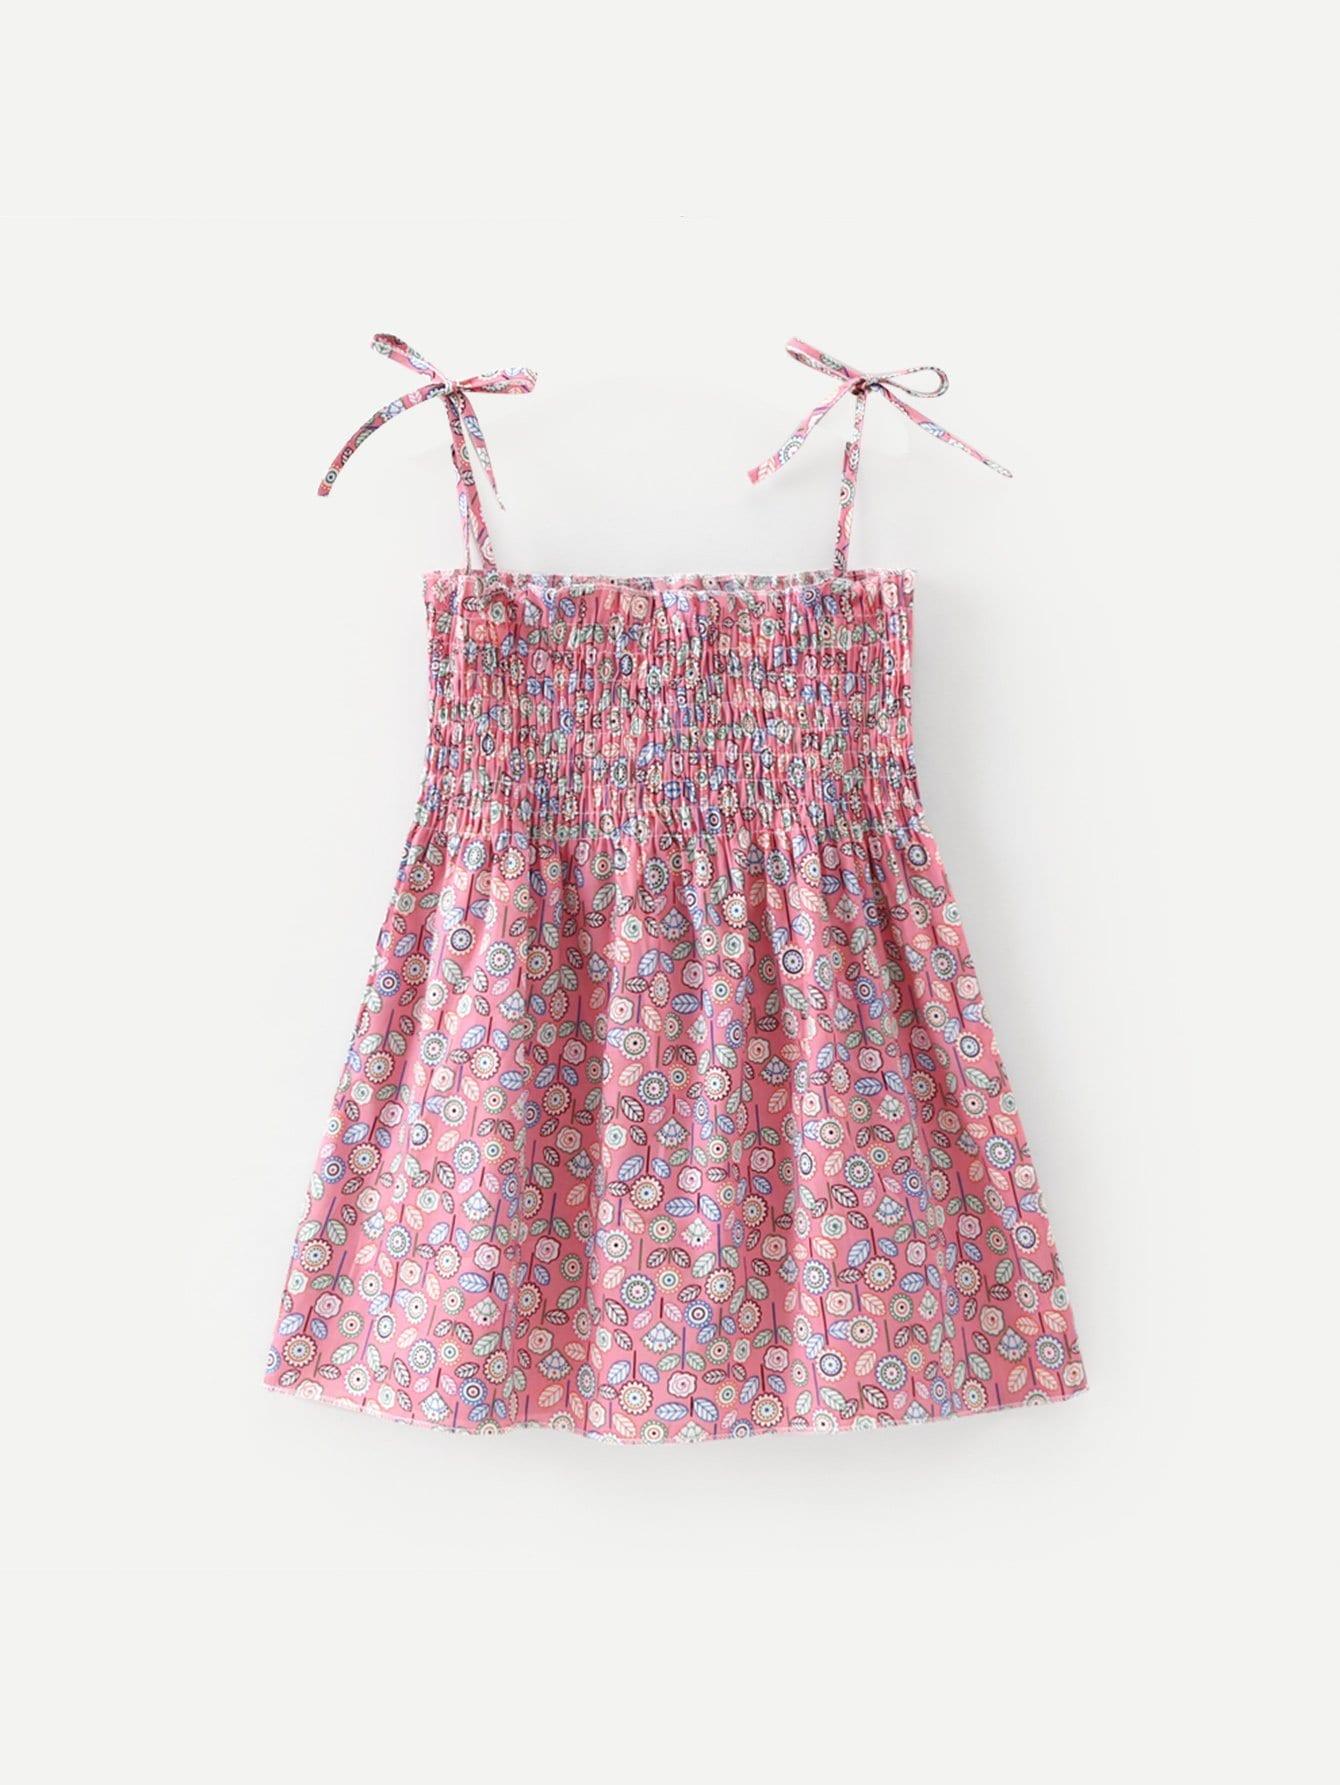 Купить Дети Calico Print Shirred Cami Dress, null, SheIn